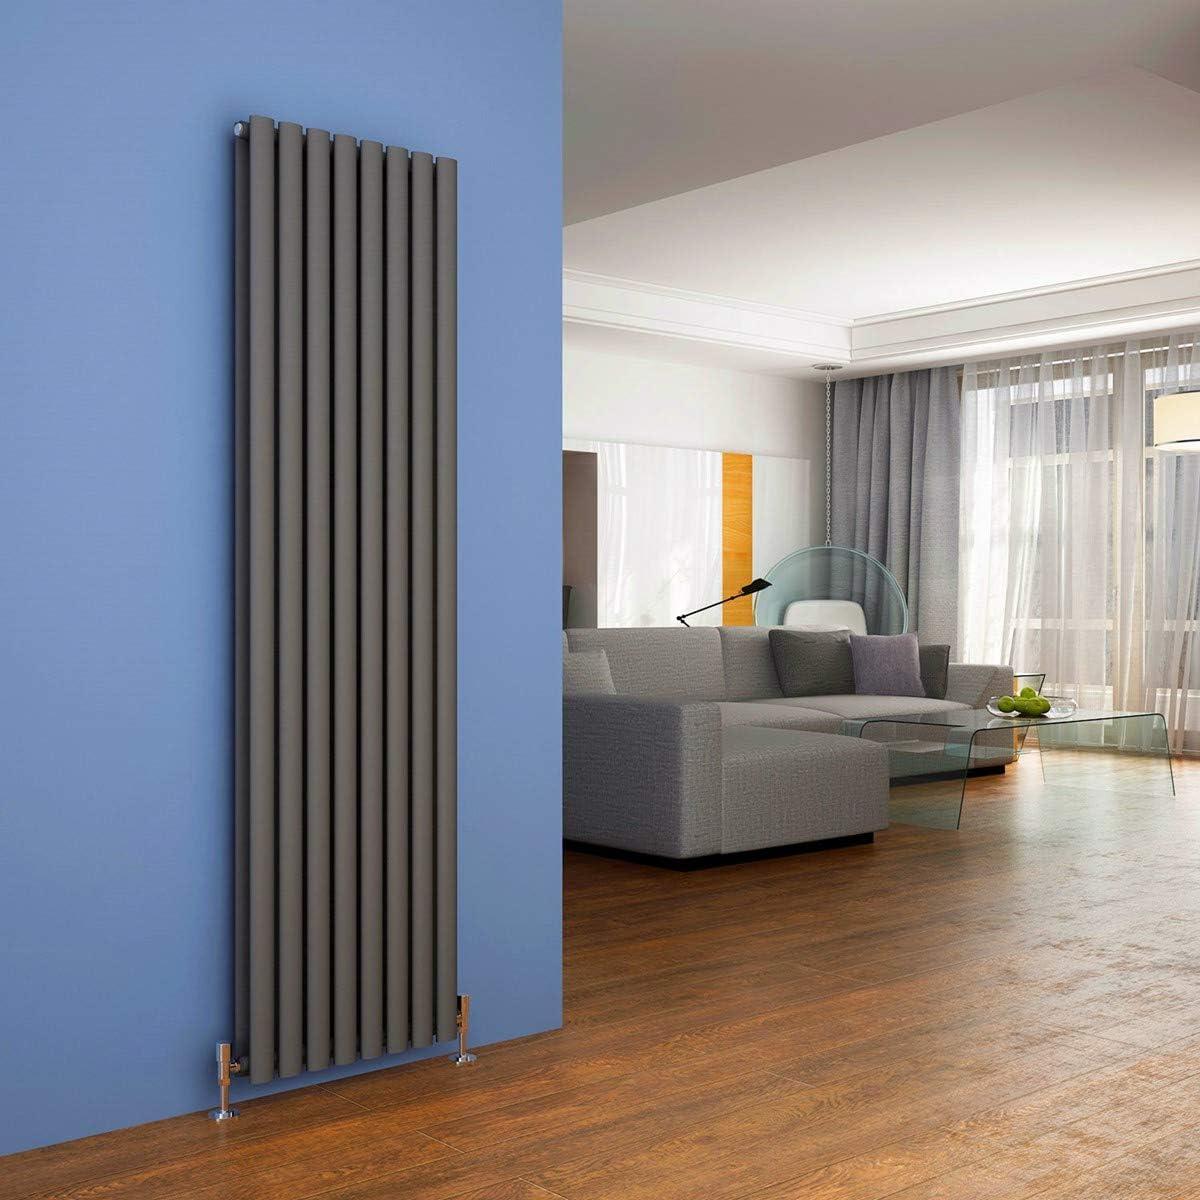 ELEGANT 1800 x 480 Anthracite Vertical Radiator Double Modern Oval Column Radiator Central Heating Radiators Designer Radiators